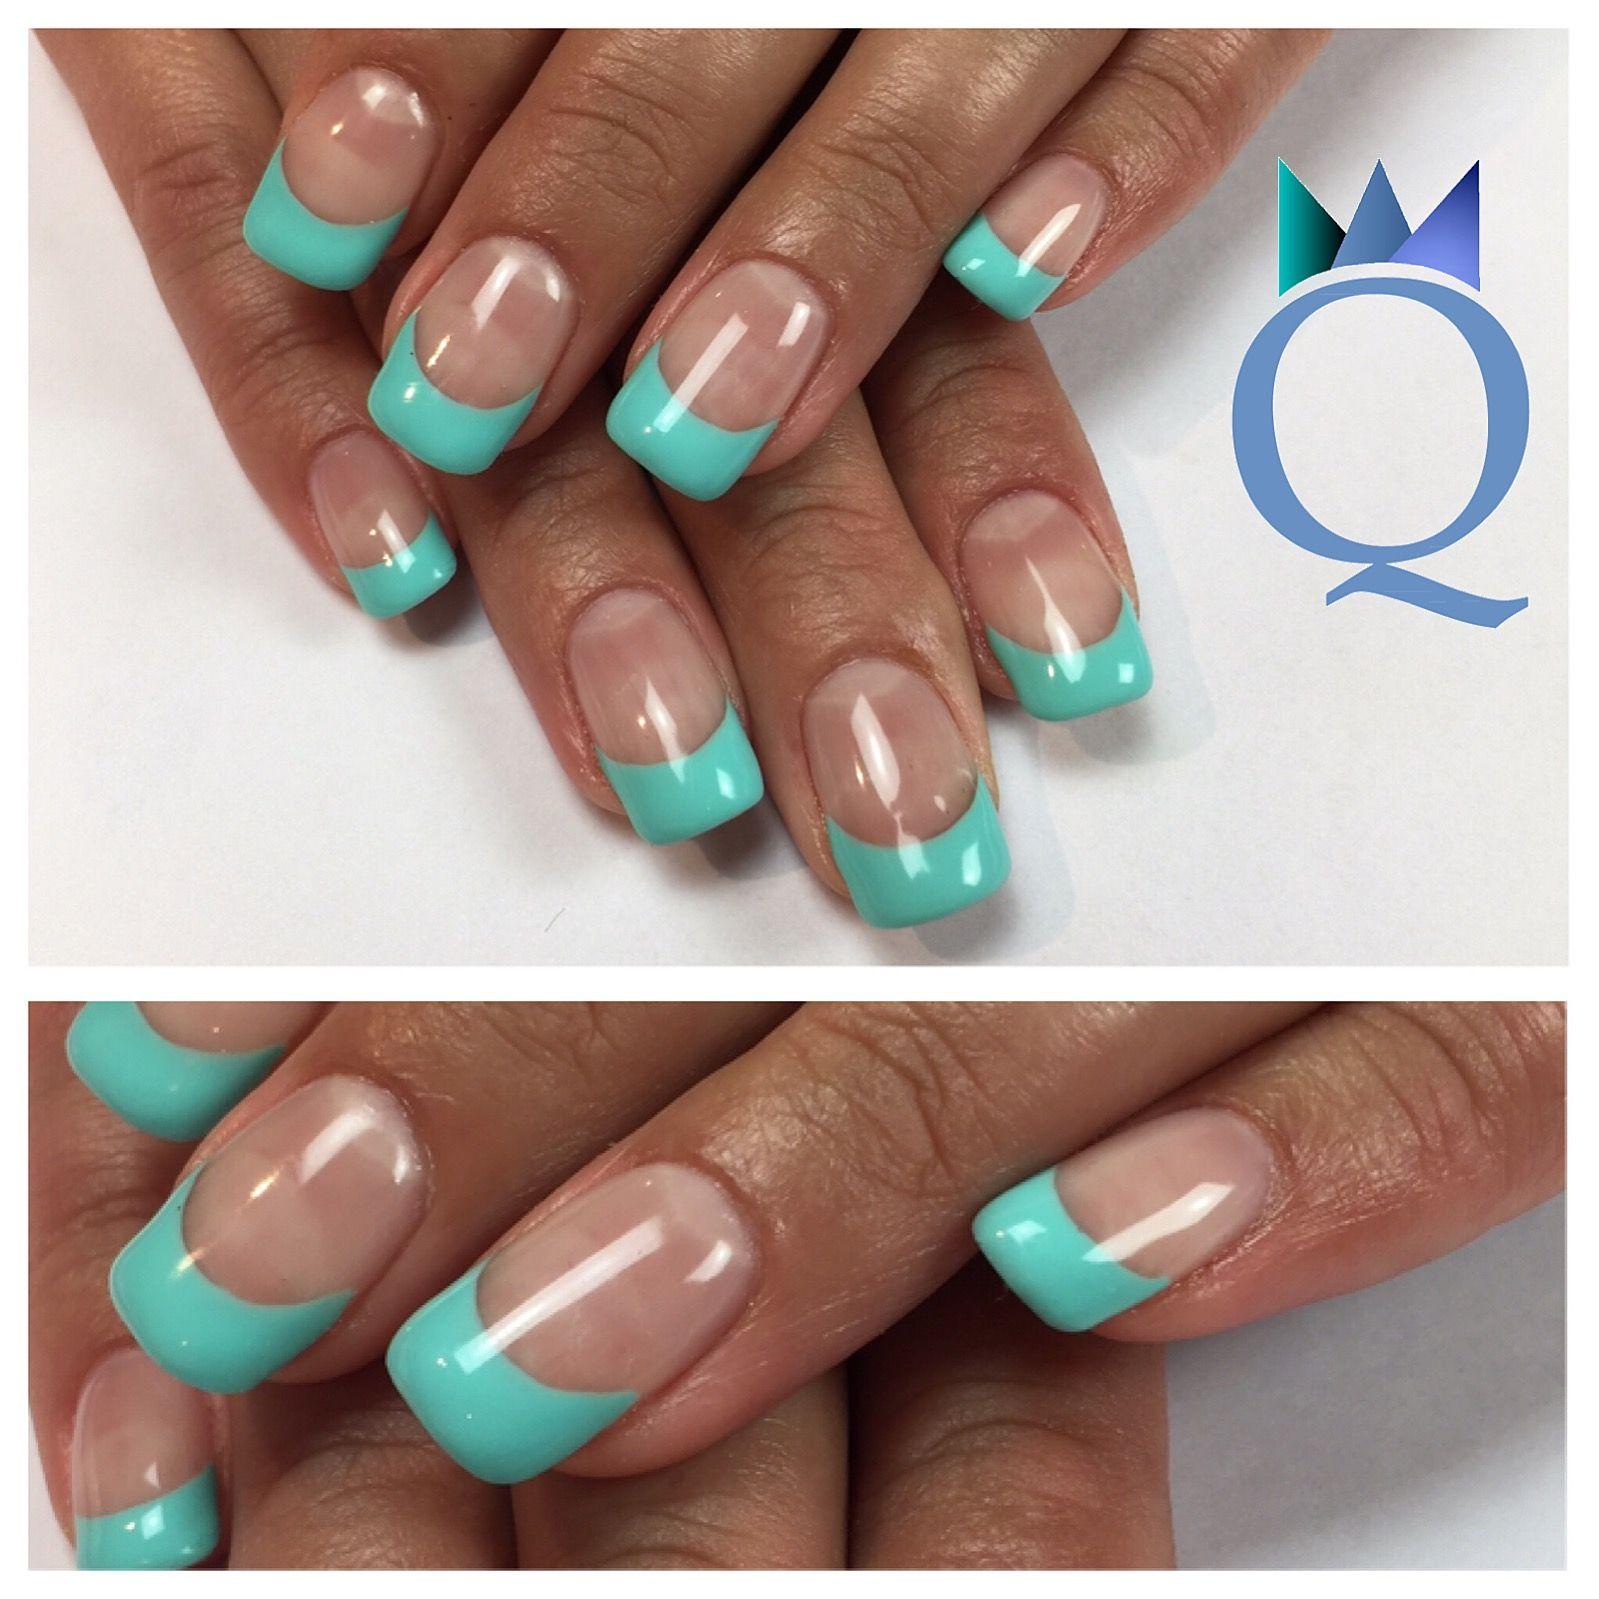 gelnails #nails #turquoise #frenchnails #gelnägel #nägel #türkis ...